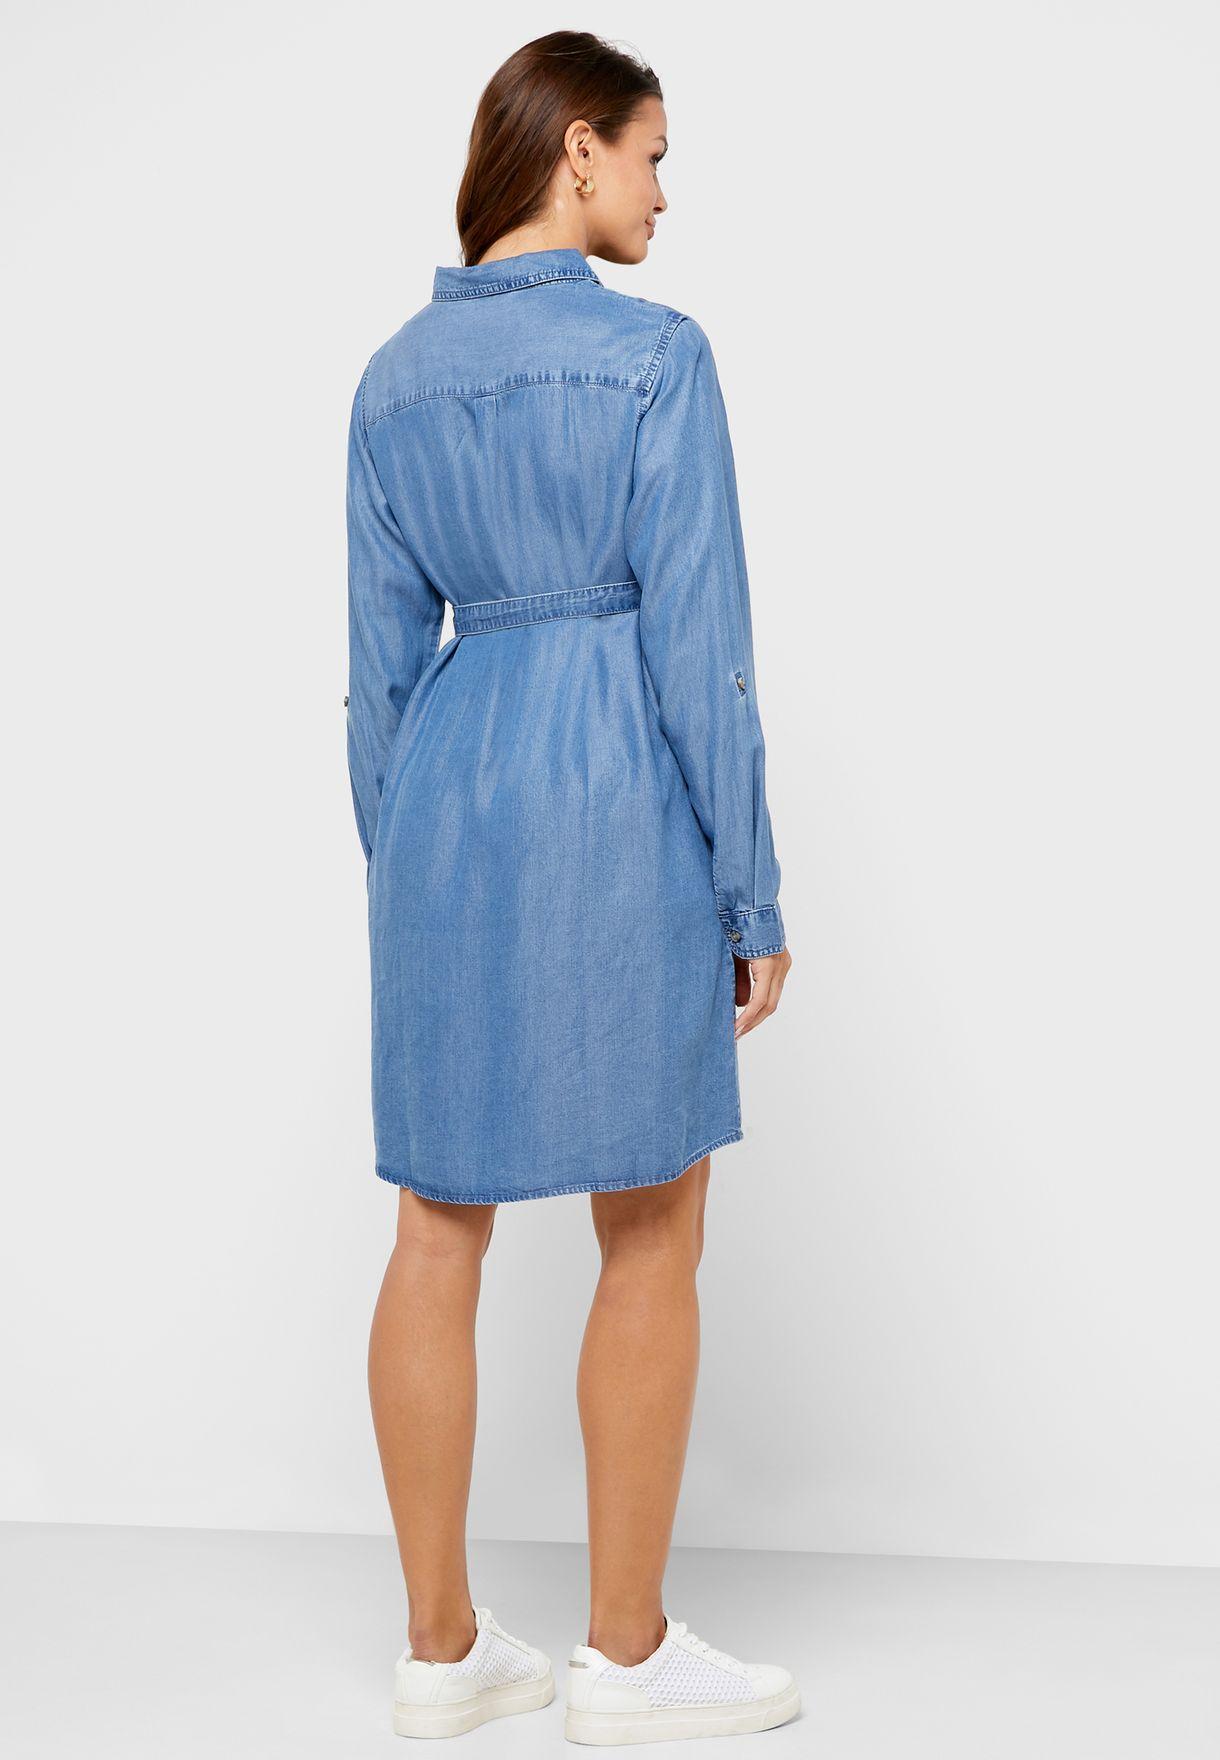 Roll Sleeve Denim Dress